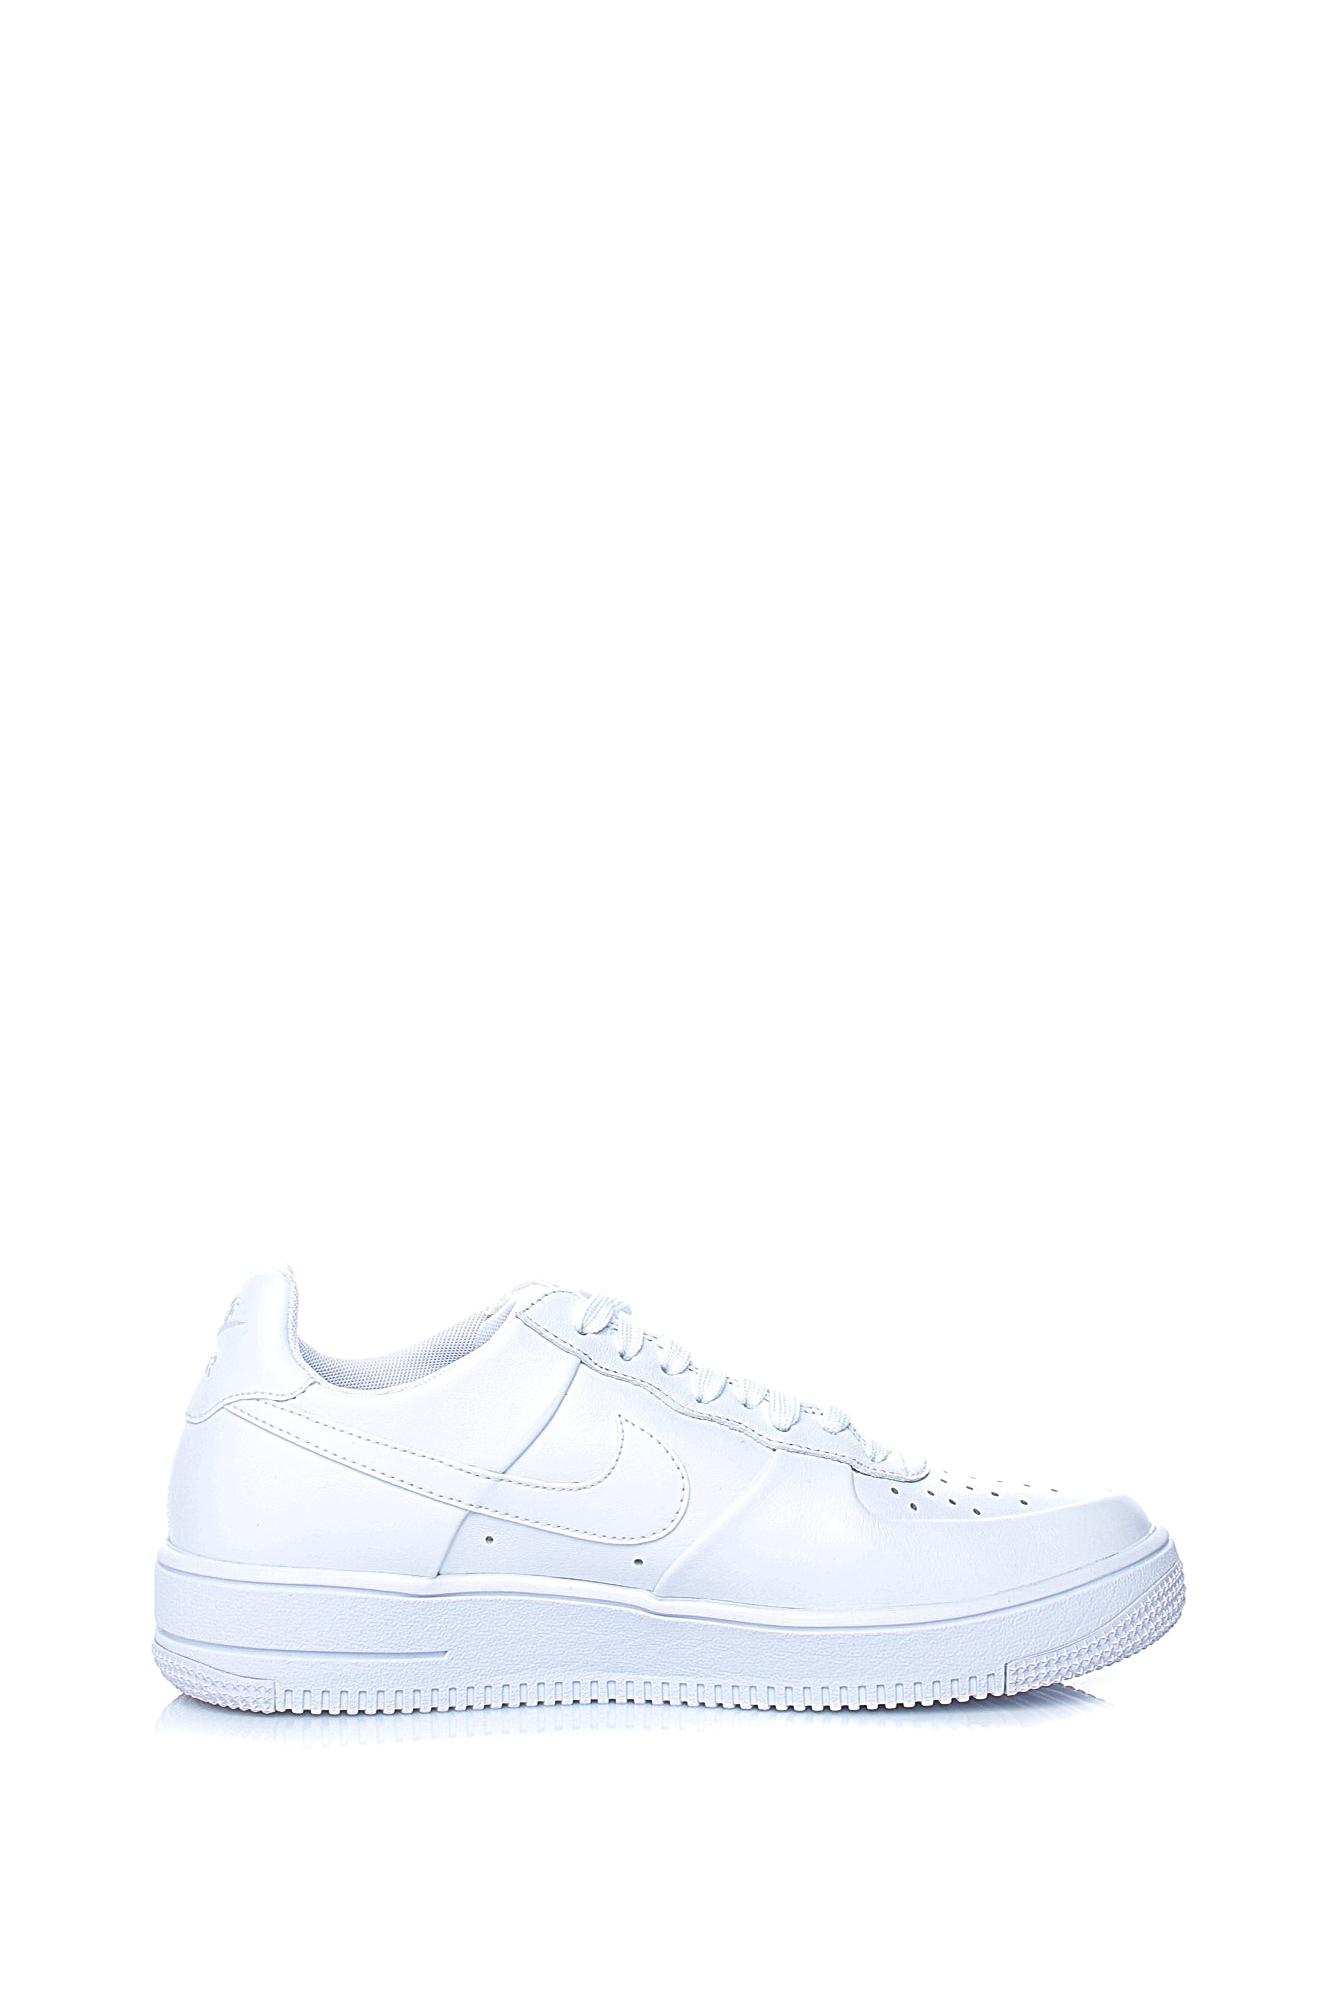 NIKE – Ανδρικά παπούτσια Nike AIR FORCE 1 ULTRAFORCE LTHR λευκά